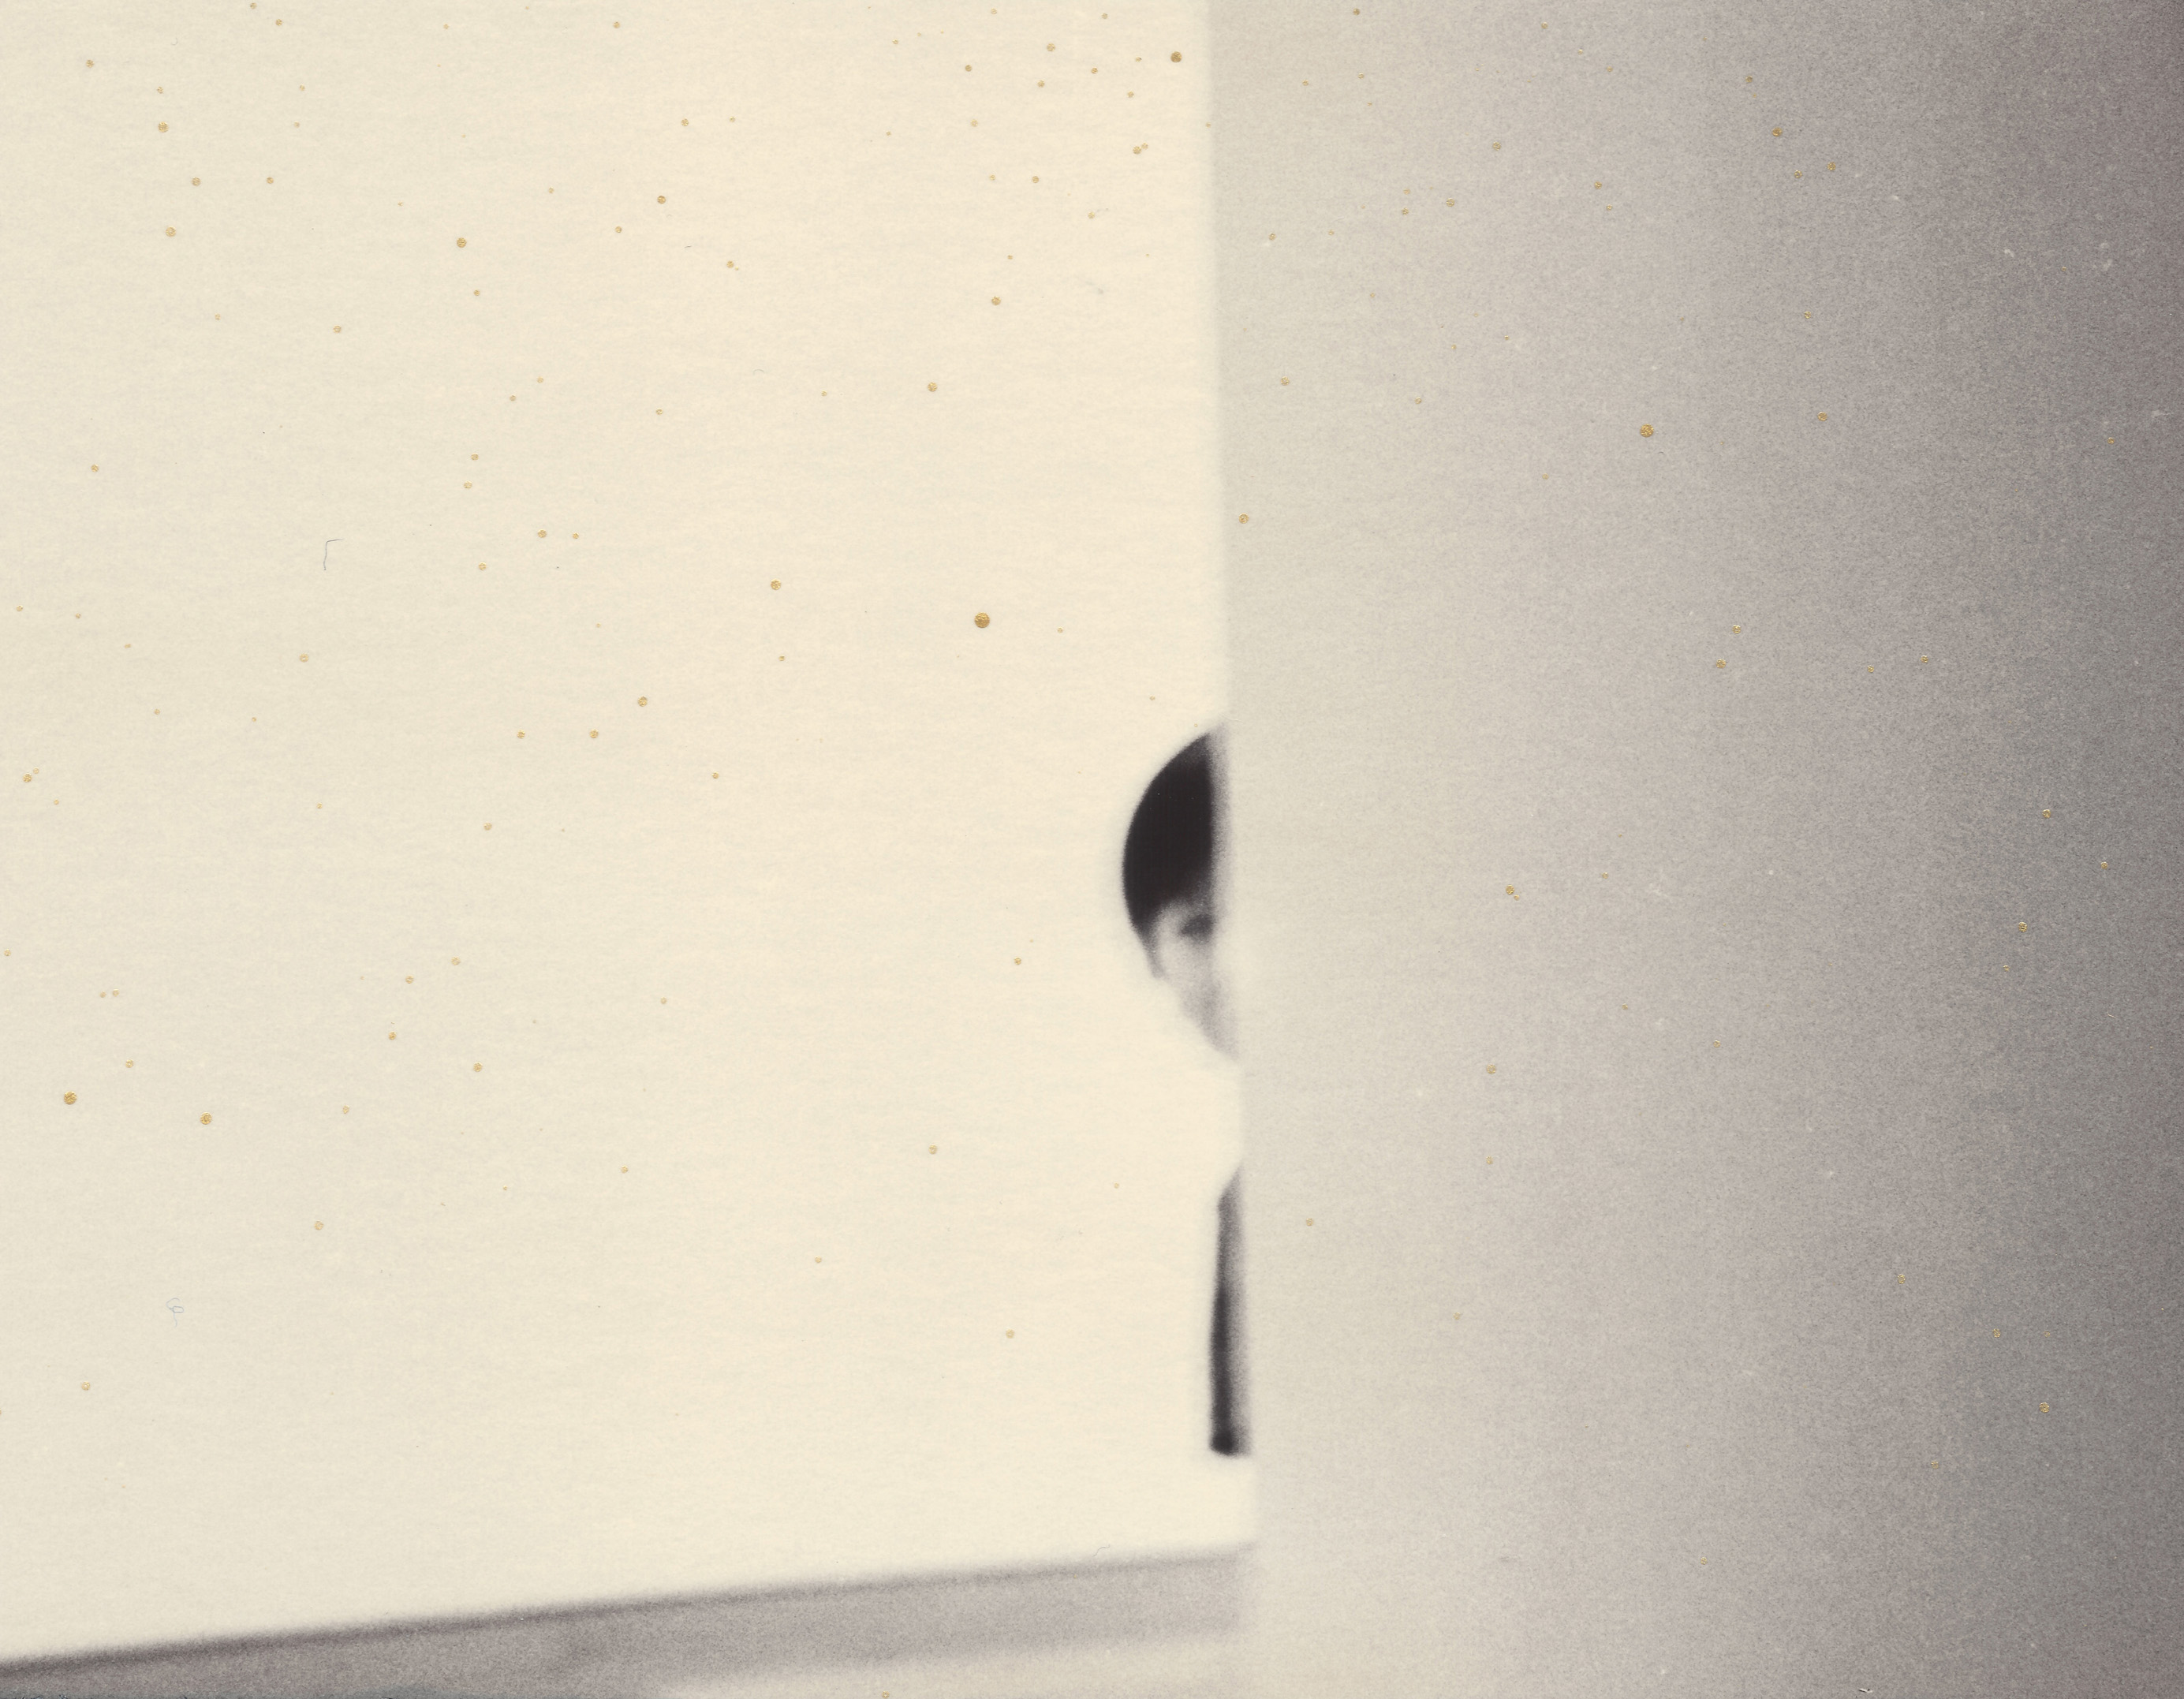 Masao Yamamoto - Nakazora 1419 - fotografia gelatina e prata e tecnica mista